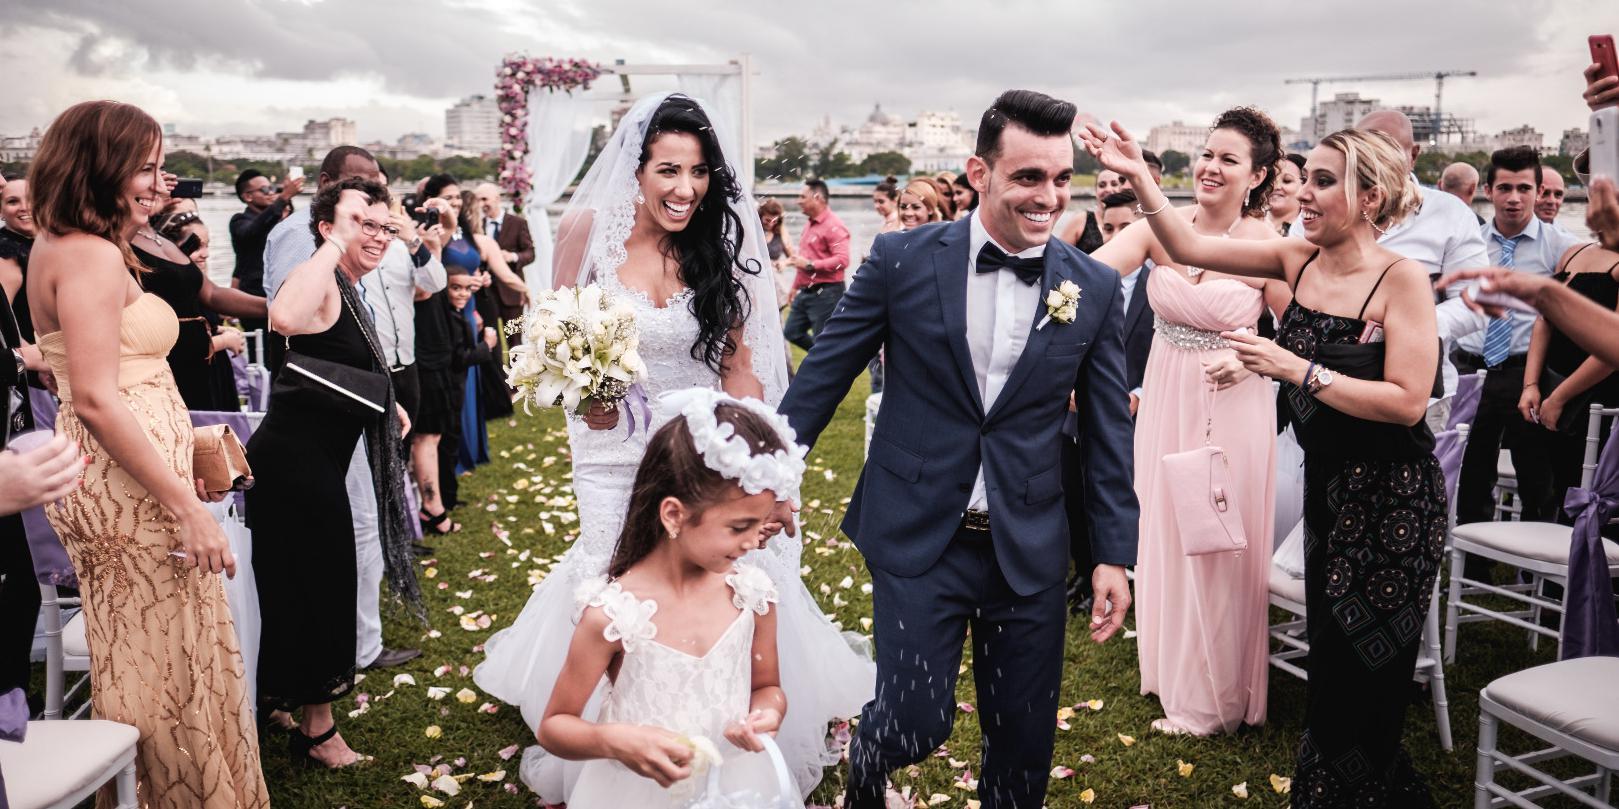 bodas-sin-clasificar-sin-tema-cuba-35611.jpg